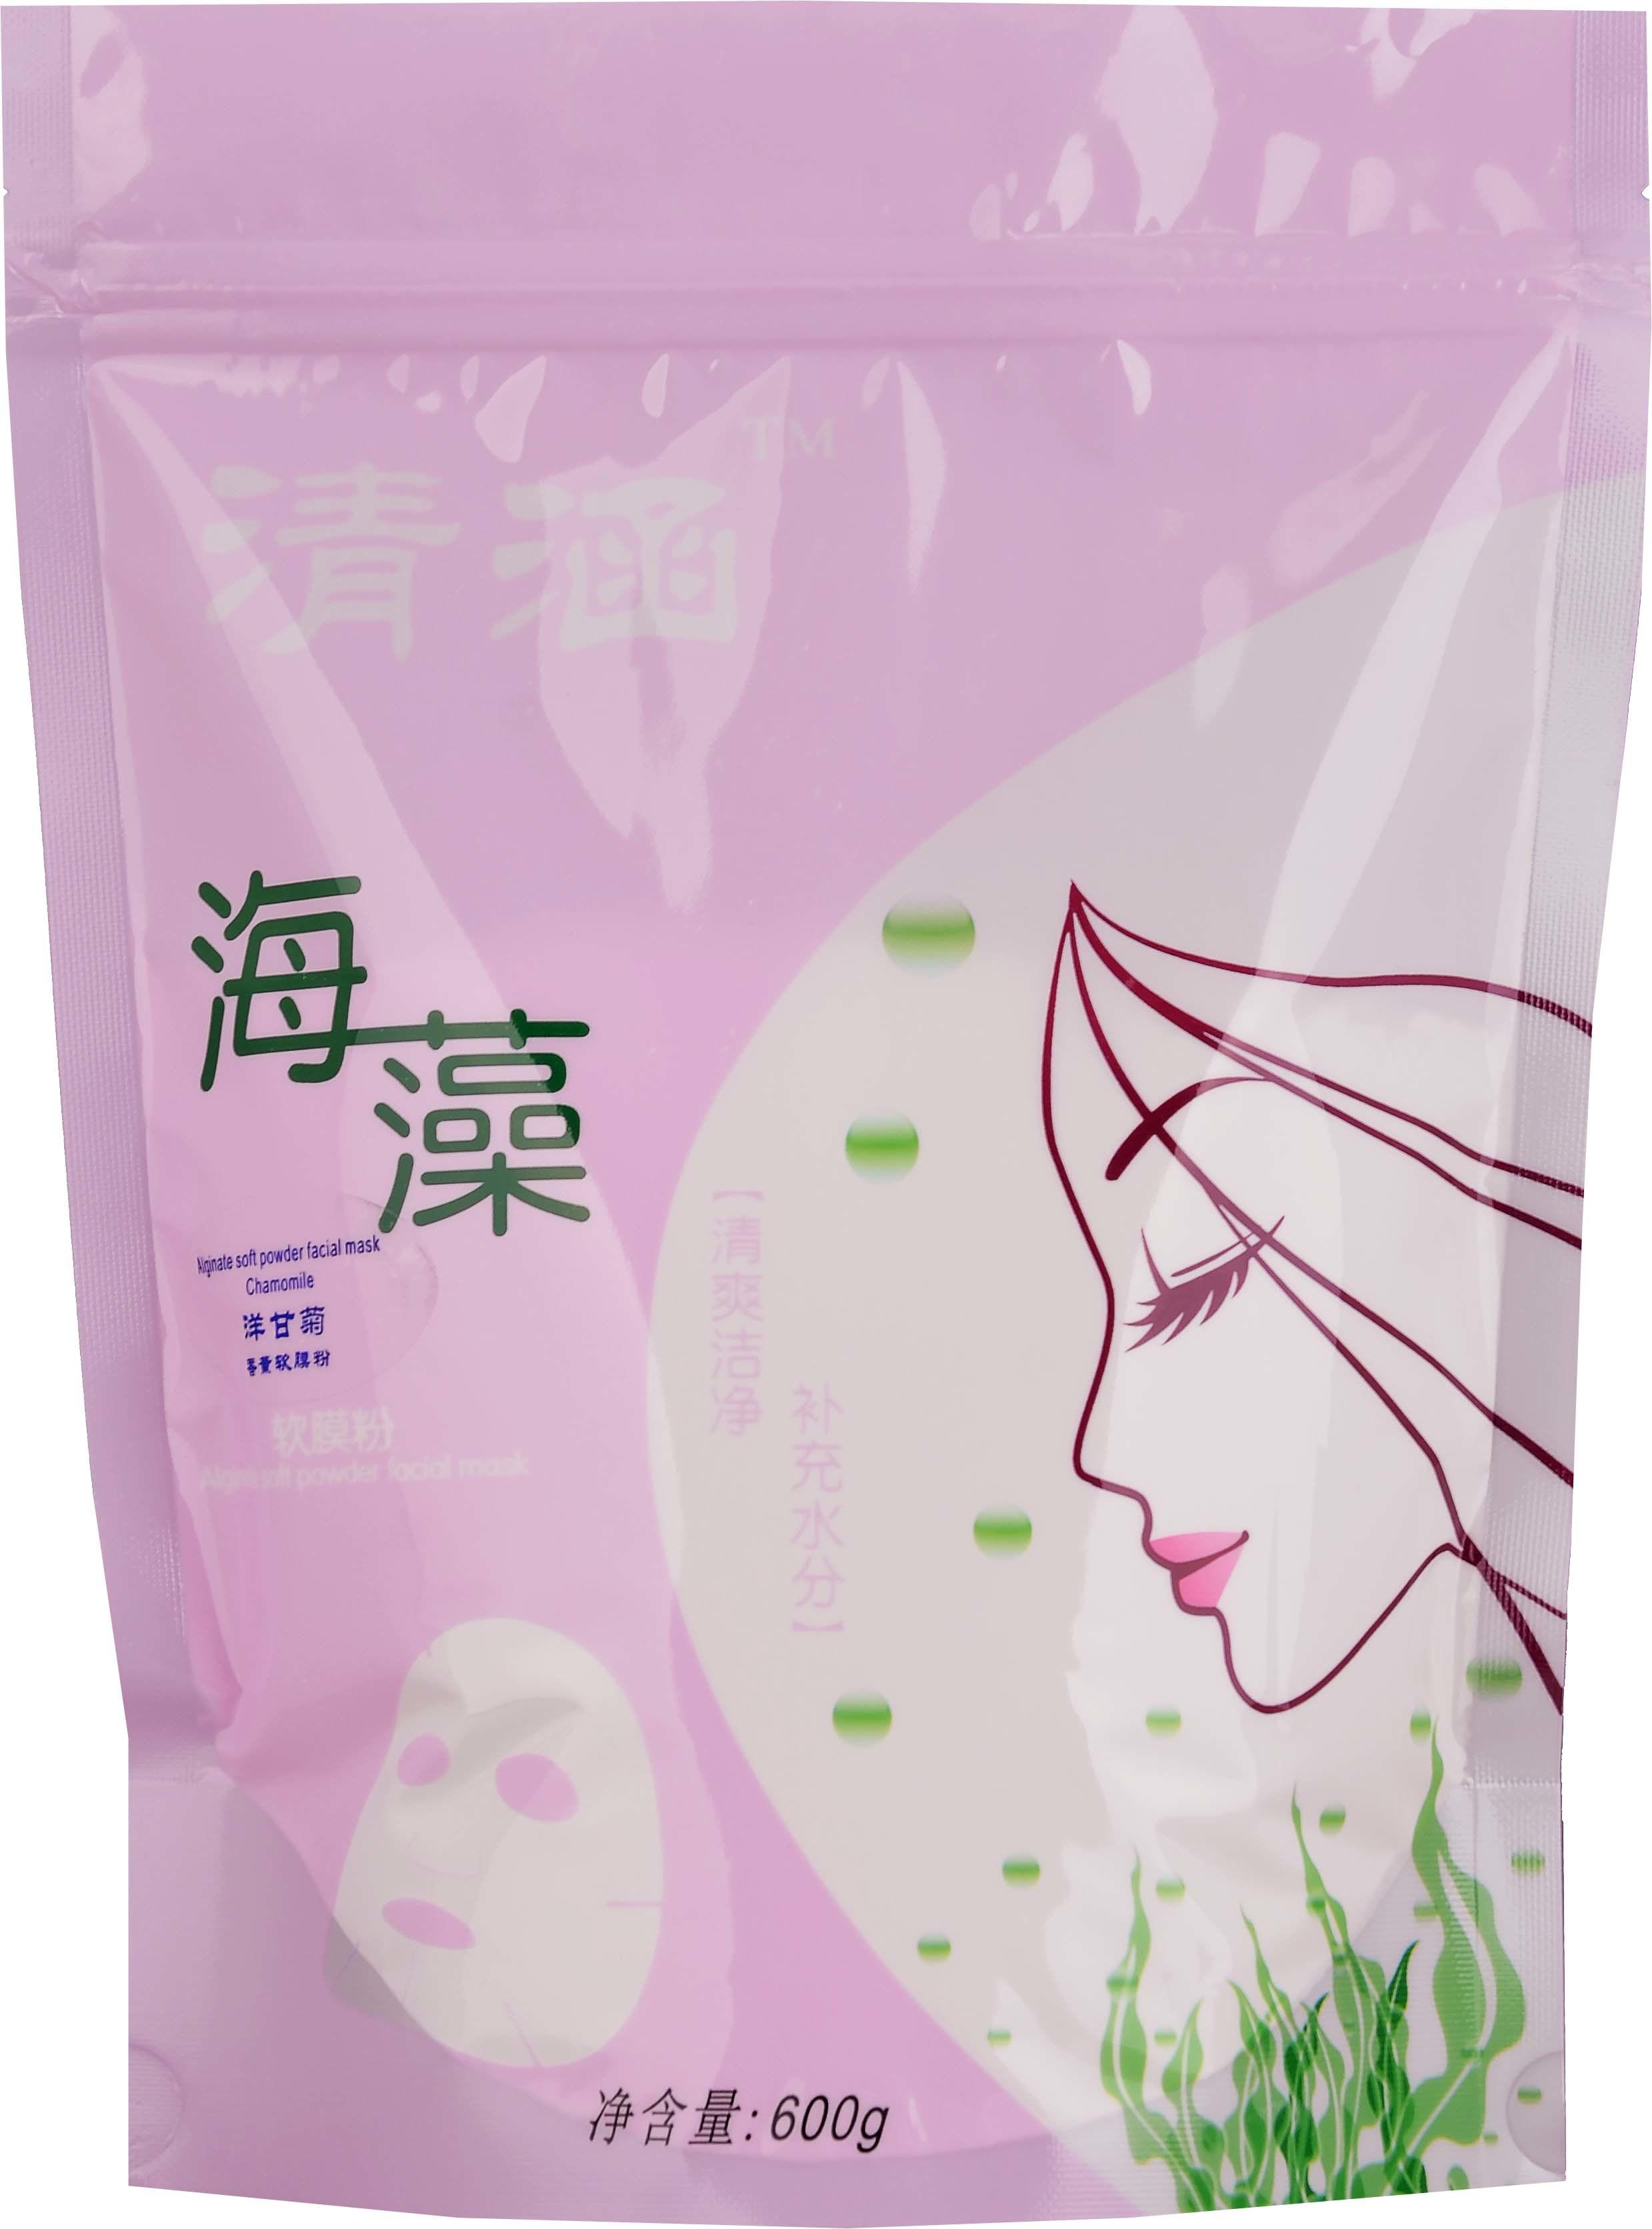 Moisturizing Skin Care Whitening Calm Chamomile Facial Mask